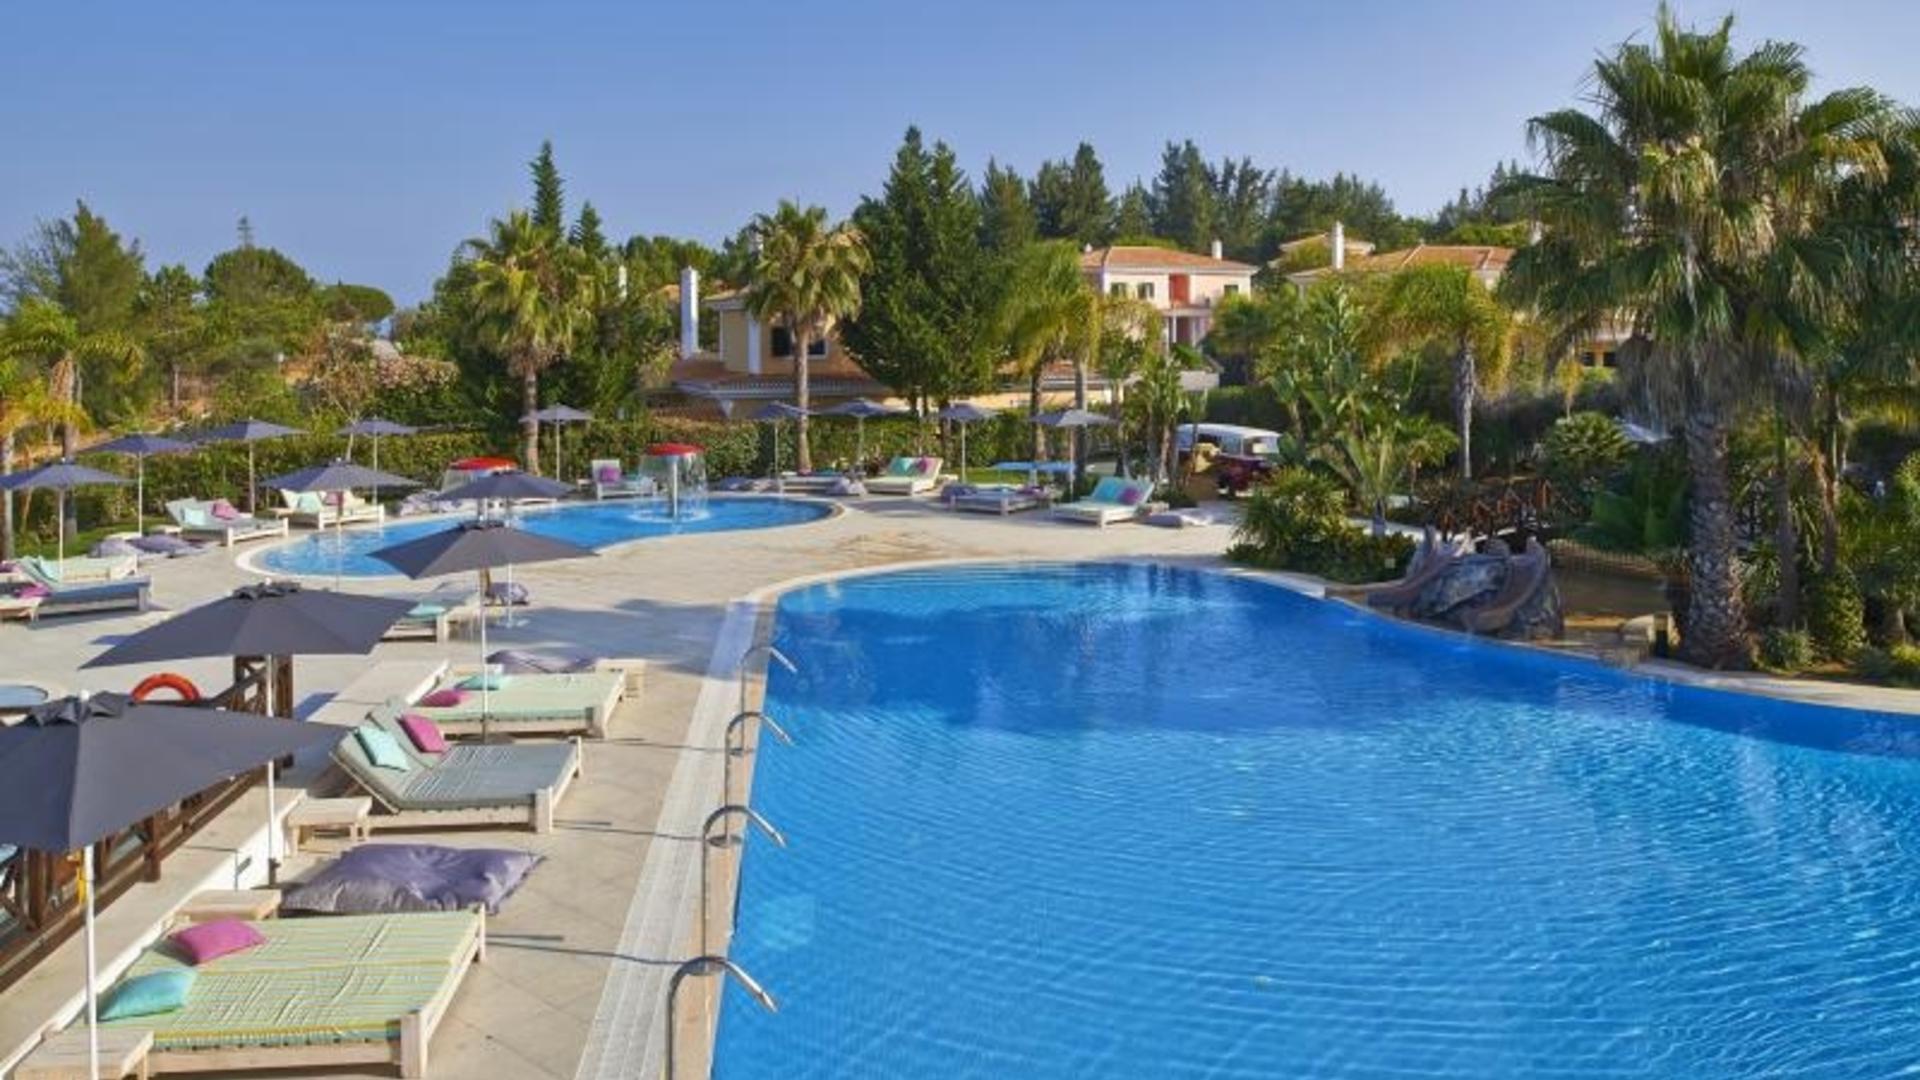 child friendly holiday resort in the Algarve Portugal - MAQU